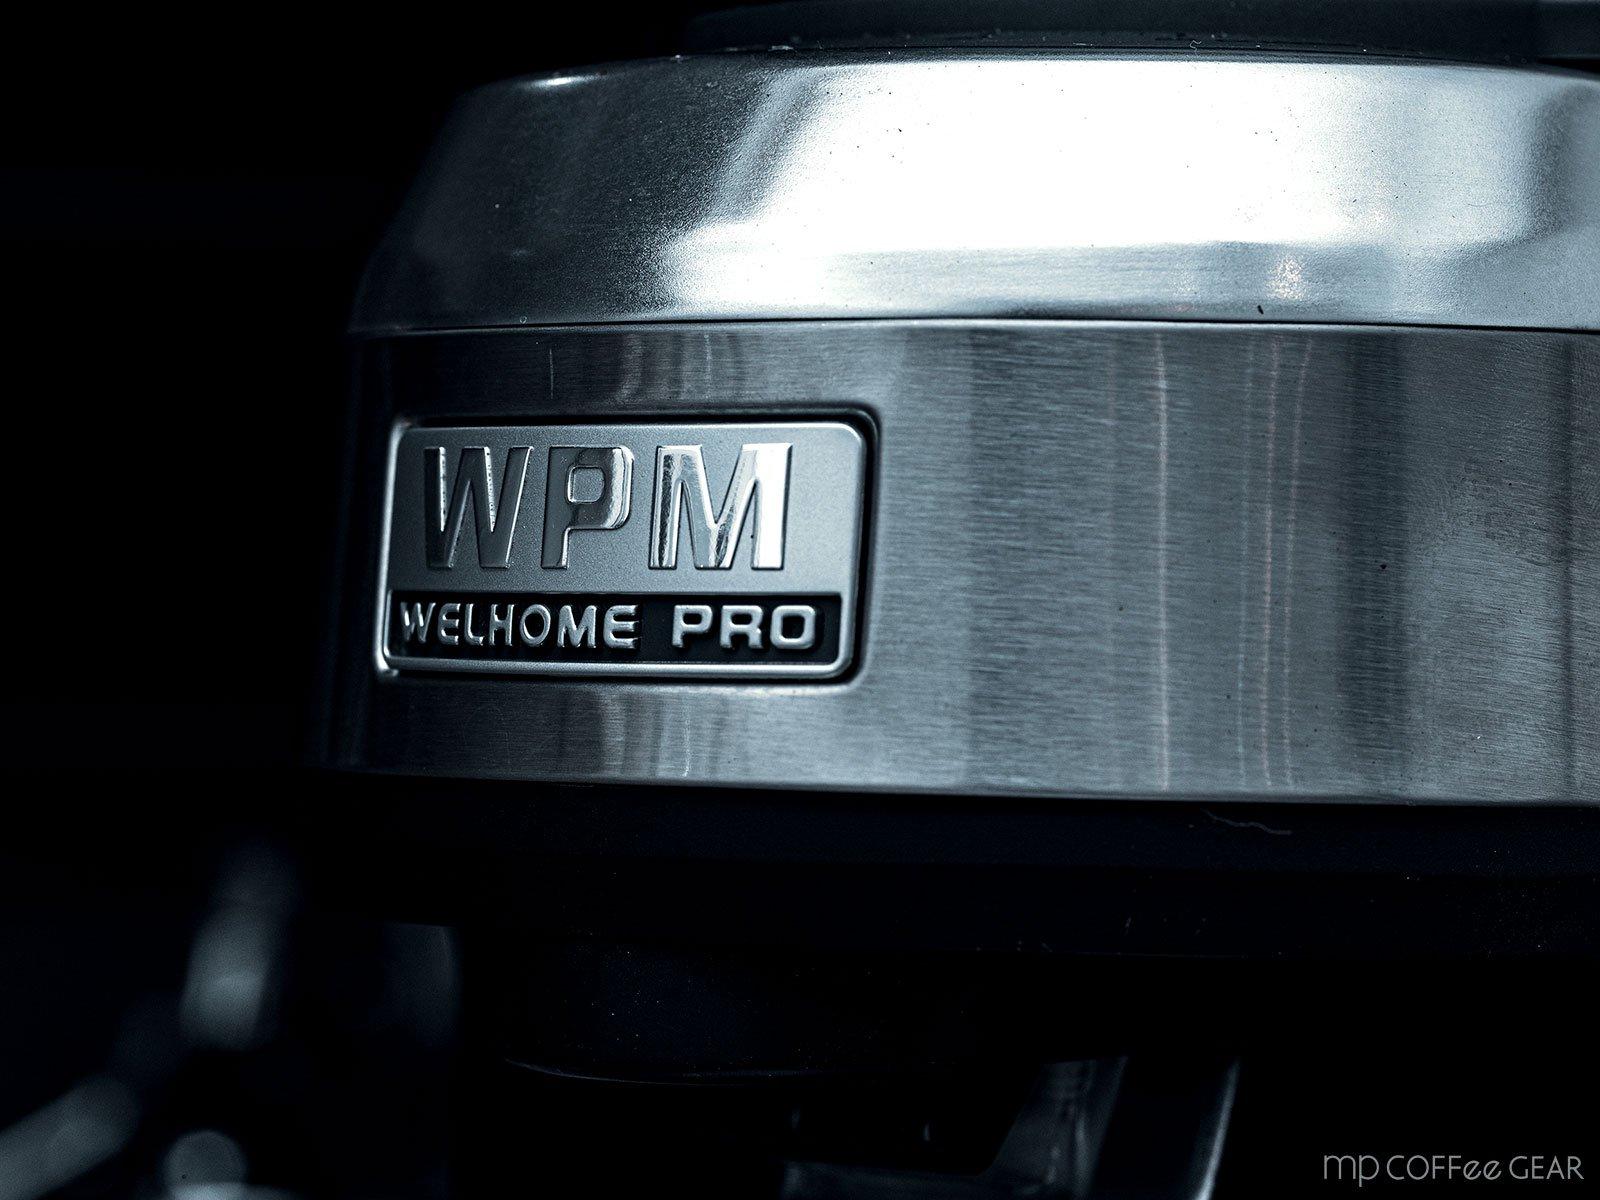 WPM WELHOME コーヒーグラインダー ZD-17N